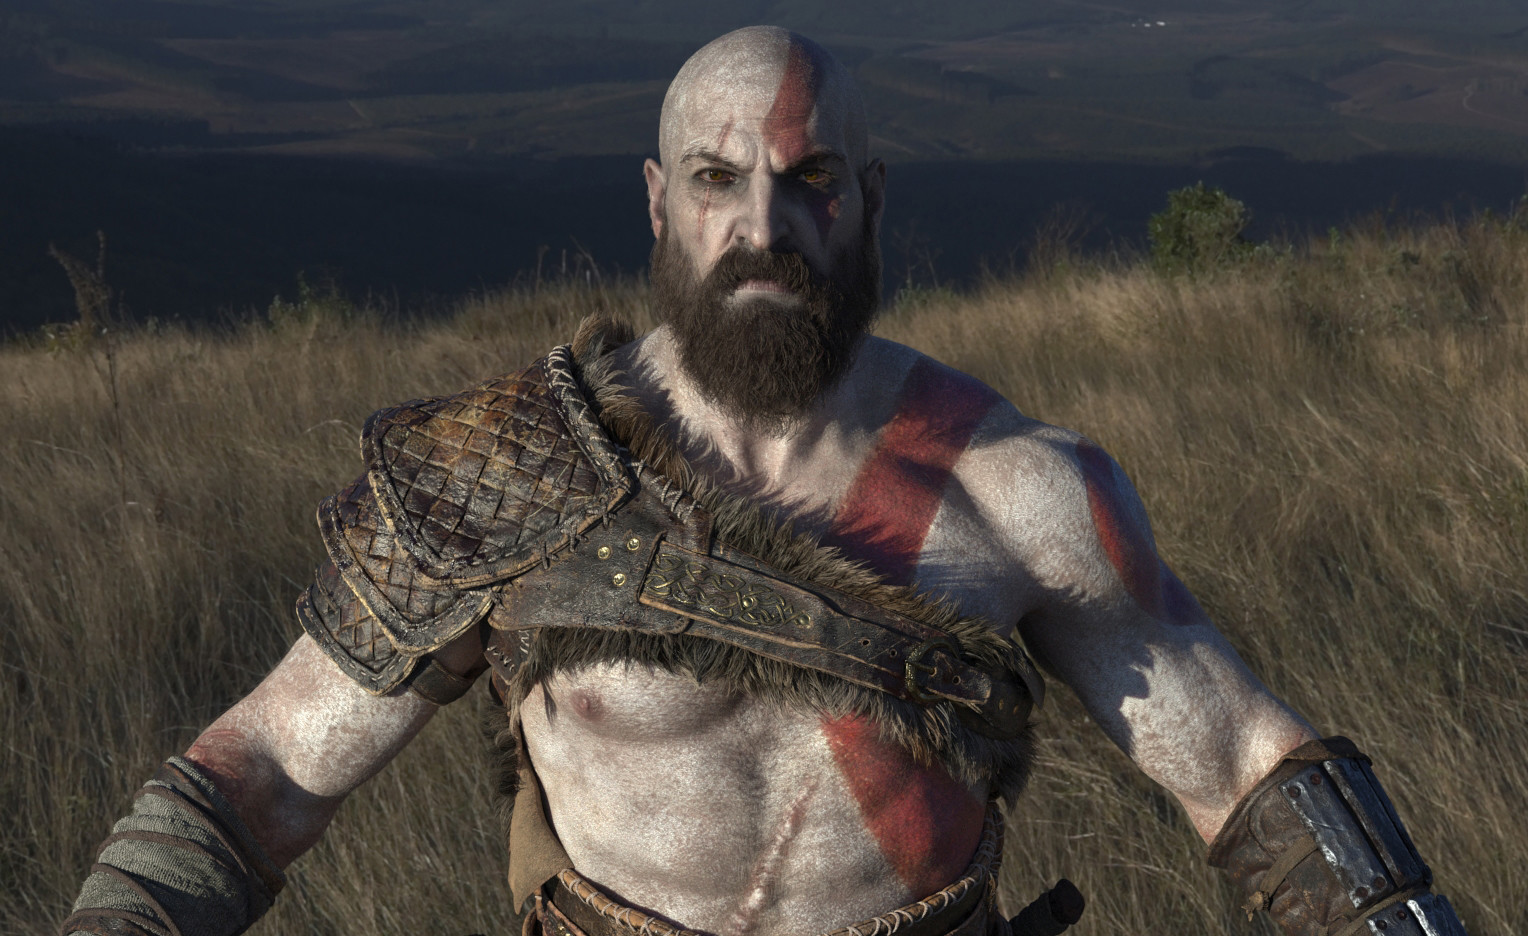 Duc phil nguyen kratos 002jpg